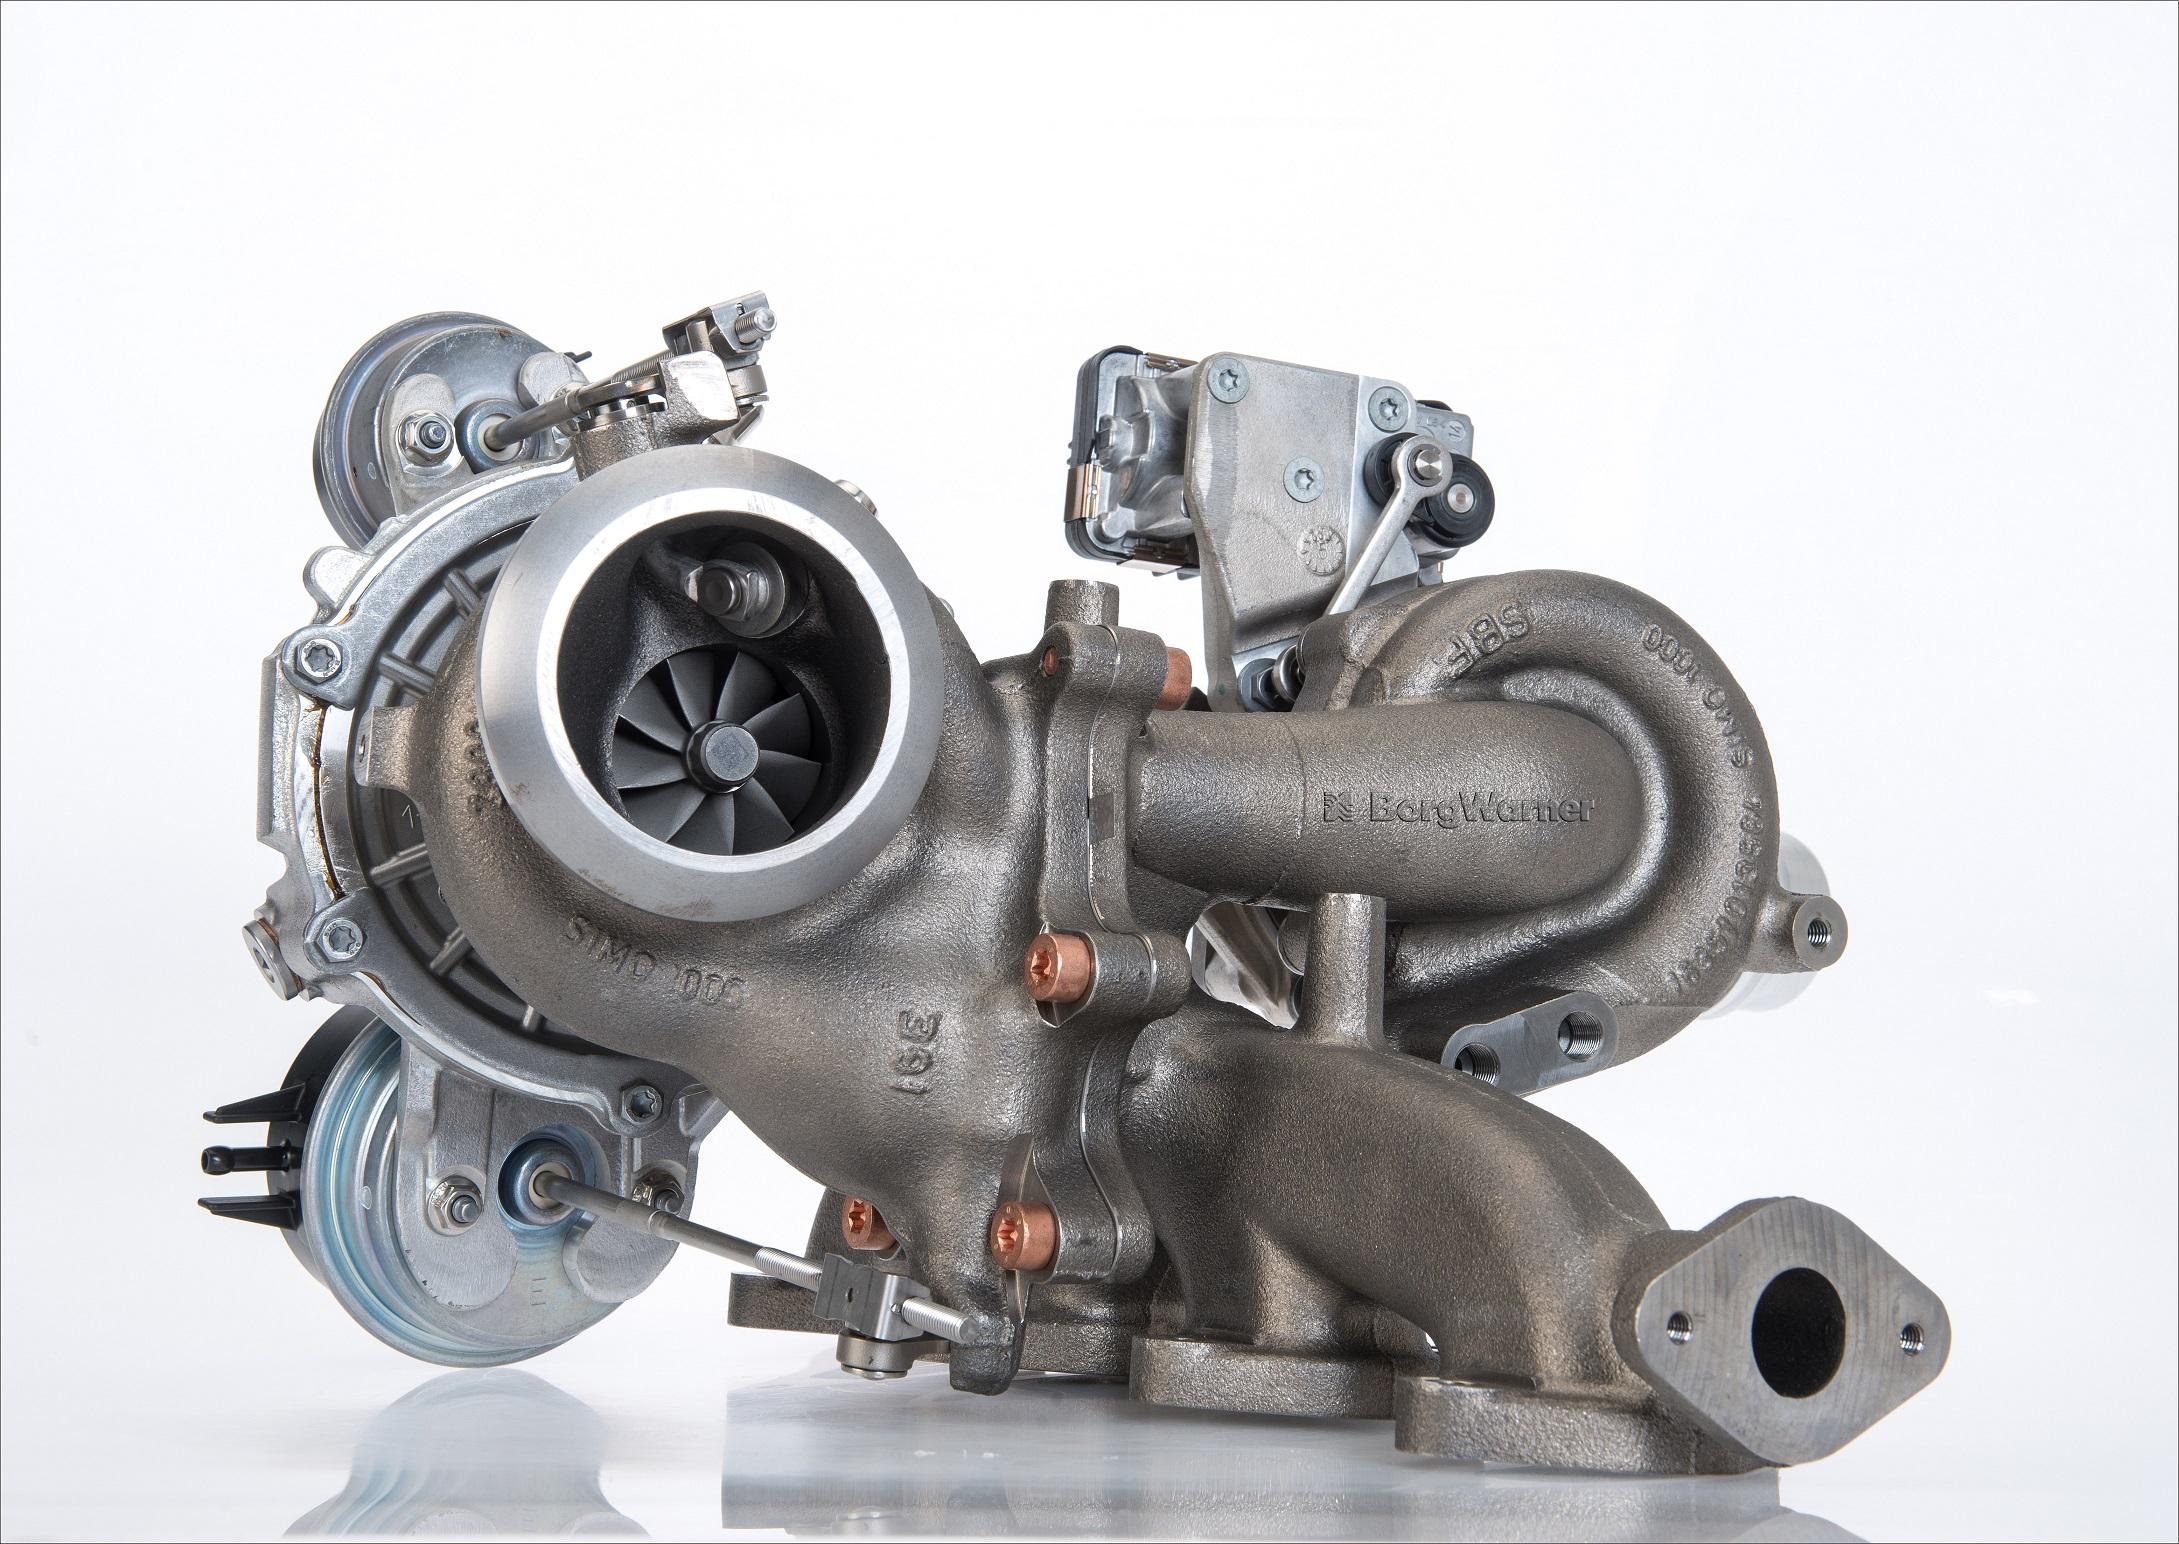 borgwarner s r2s turbocharger drives jlr s new 2 0 litre i4 diesel engine auto components india. Black Bedroom Furniture Sets. Home Design Ideas